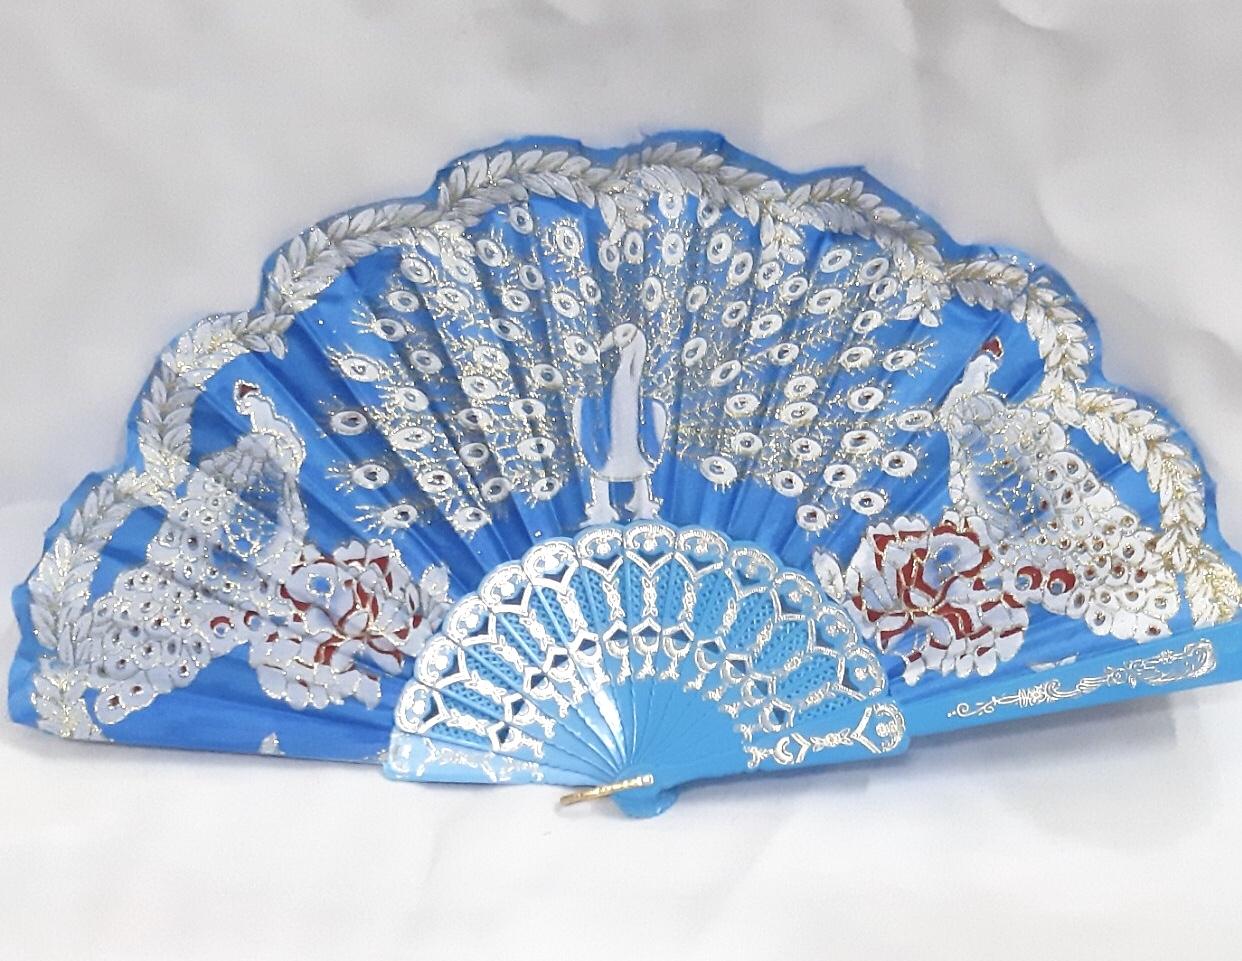 safimex handicraft Silk Fan design 06